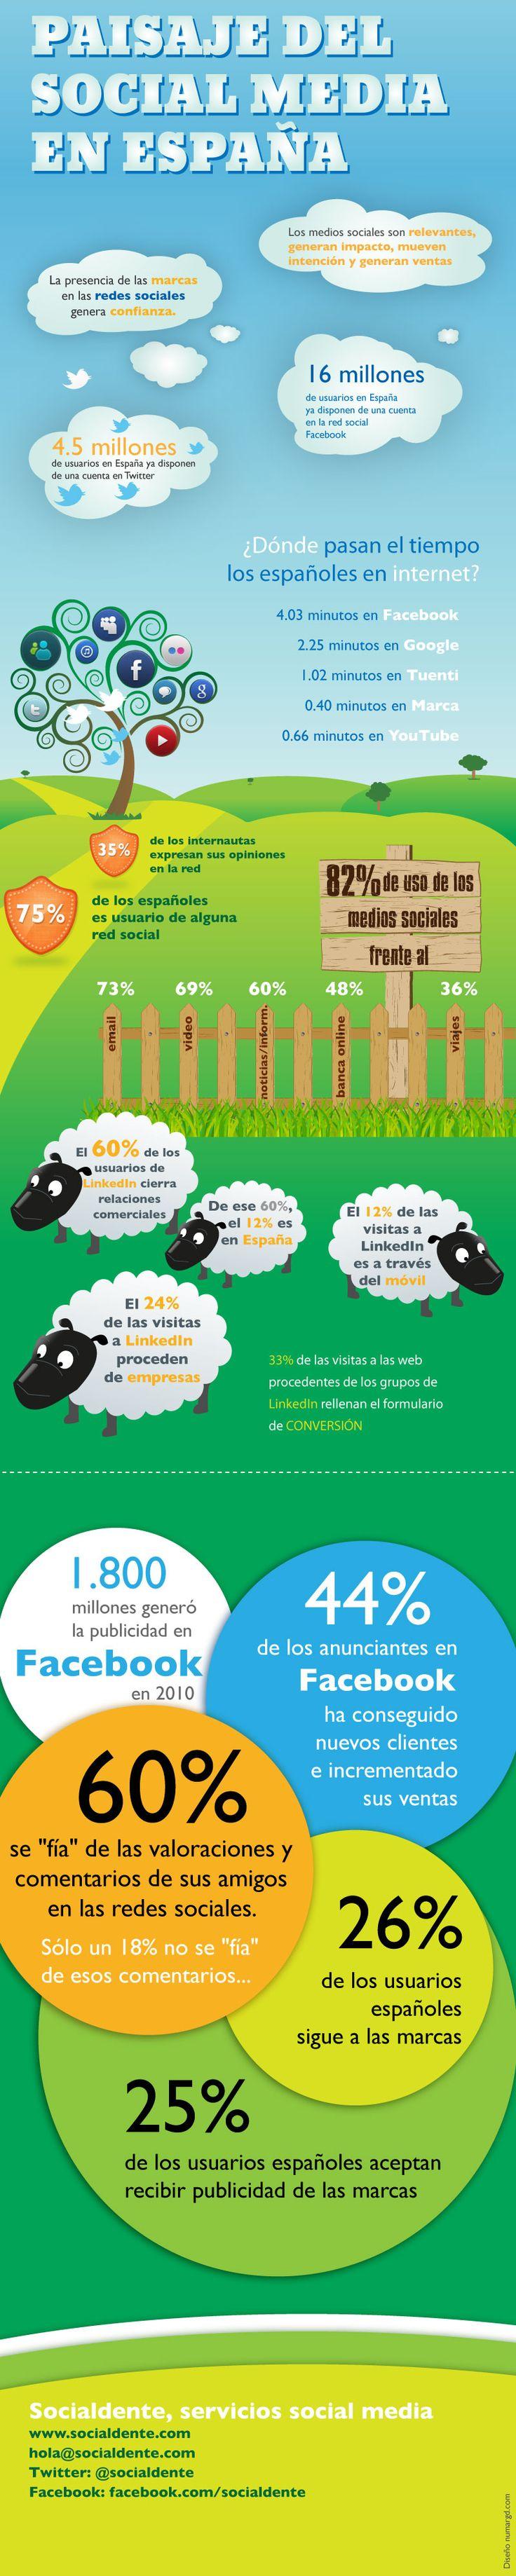 #Infografía: Paisaje del social media en España